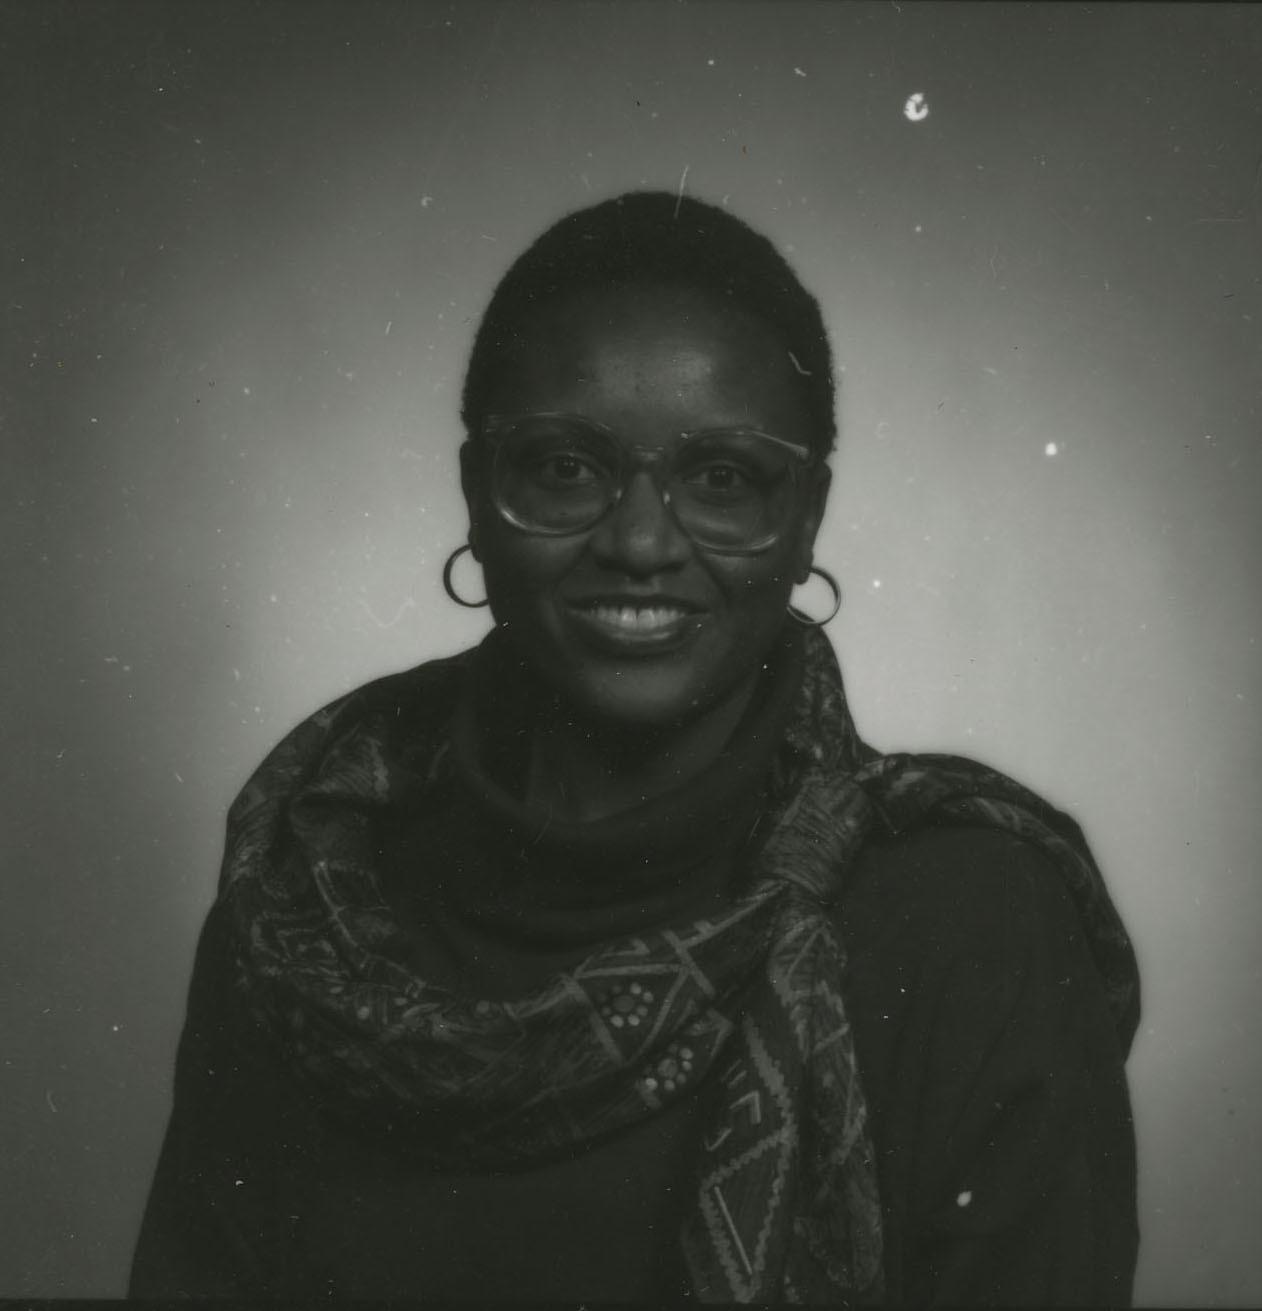 http://spec.lib.vt.edu/pickup/Omeka_upload/Tlou_LehlohonoloLitha_1991.jpg